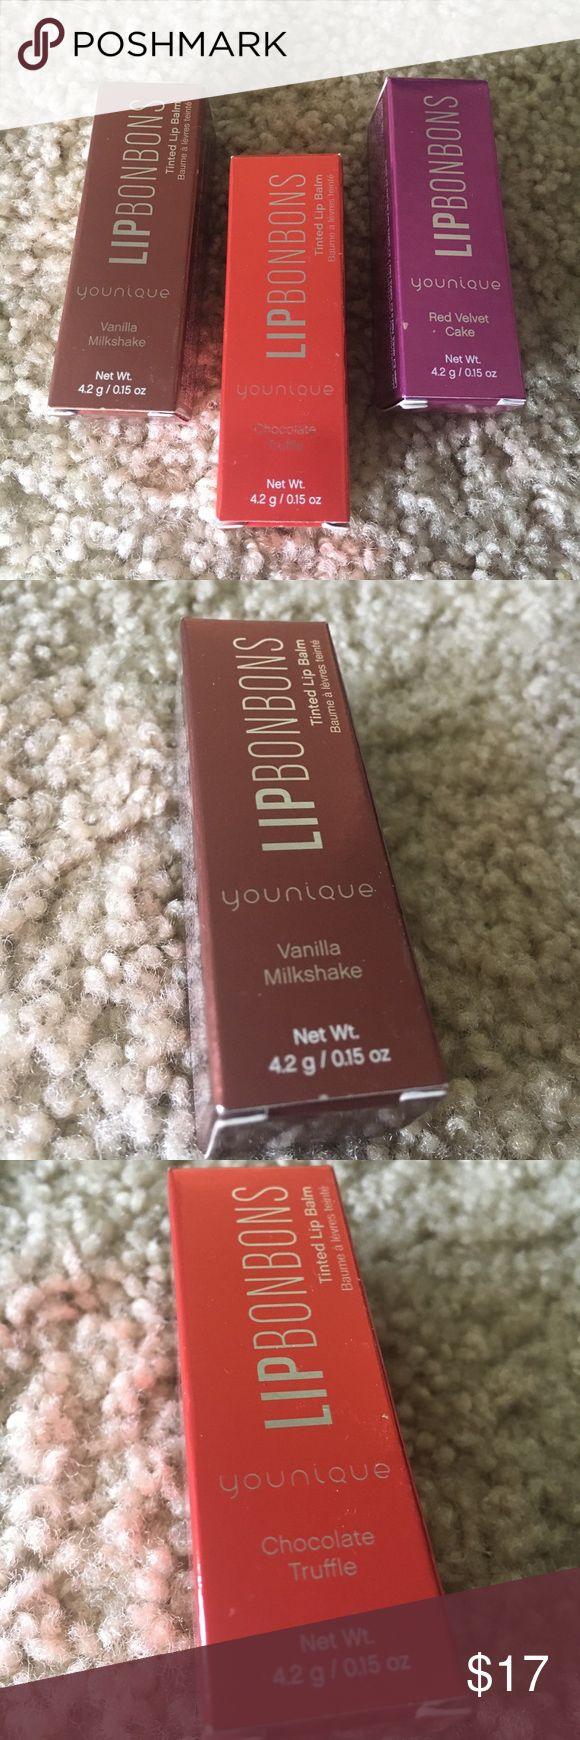 NWOT Lip Bon Bons 👄 3 Younique Lip Bonbon lip balms. 1 Vanilla Milkshake, 1 Chocolate Truffle & 1 Red Velvet Cake. Opened once, never used! Originally $22 each, selling for $17 each OR $35 as a set! 😘 Younique Makeup Lip Balm & Gloss